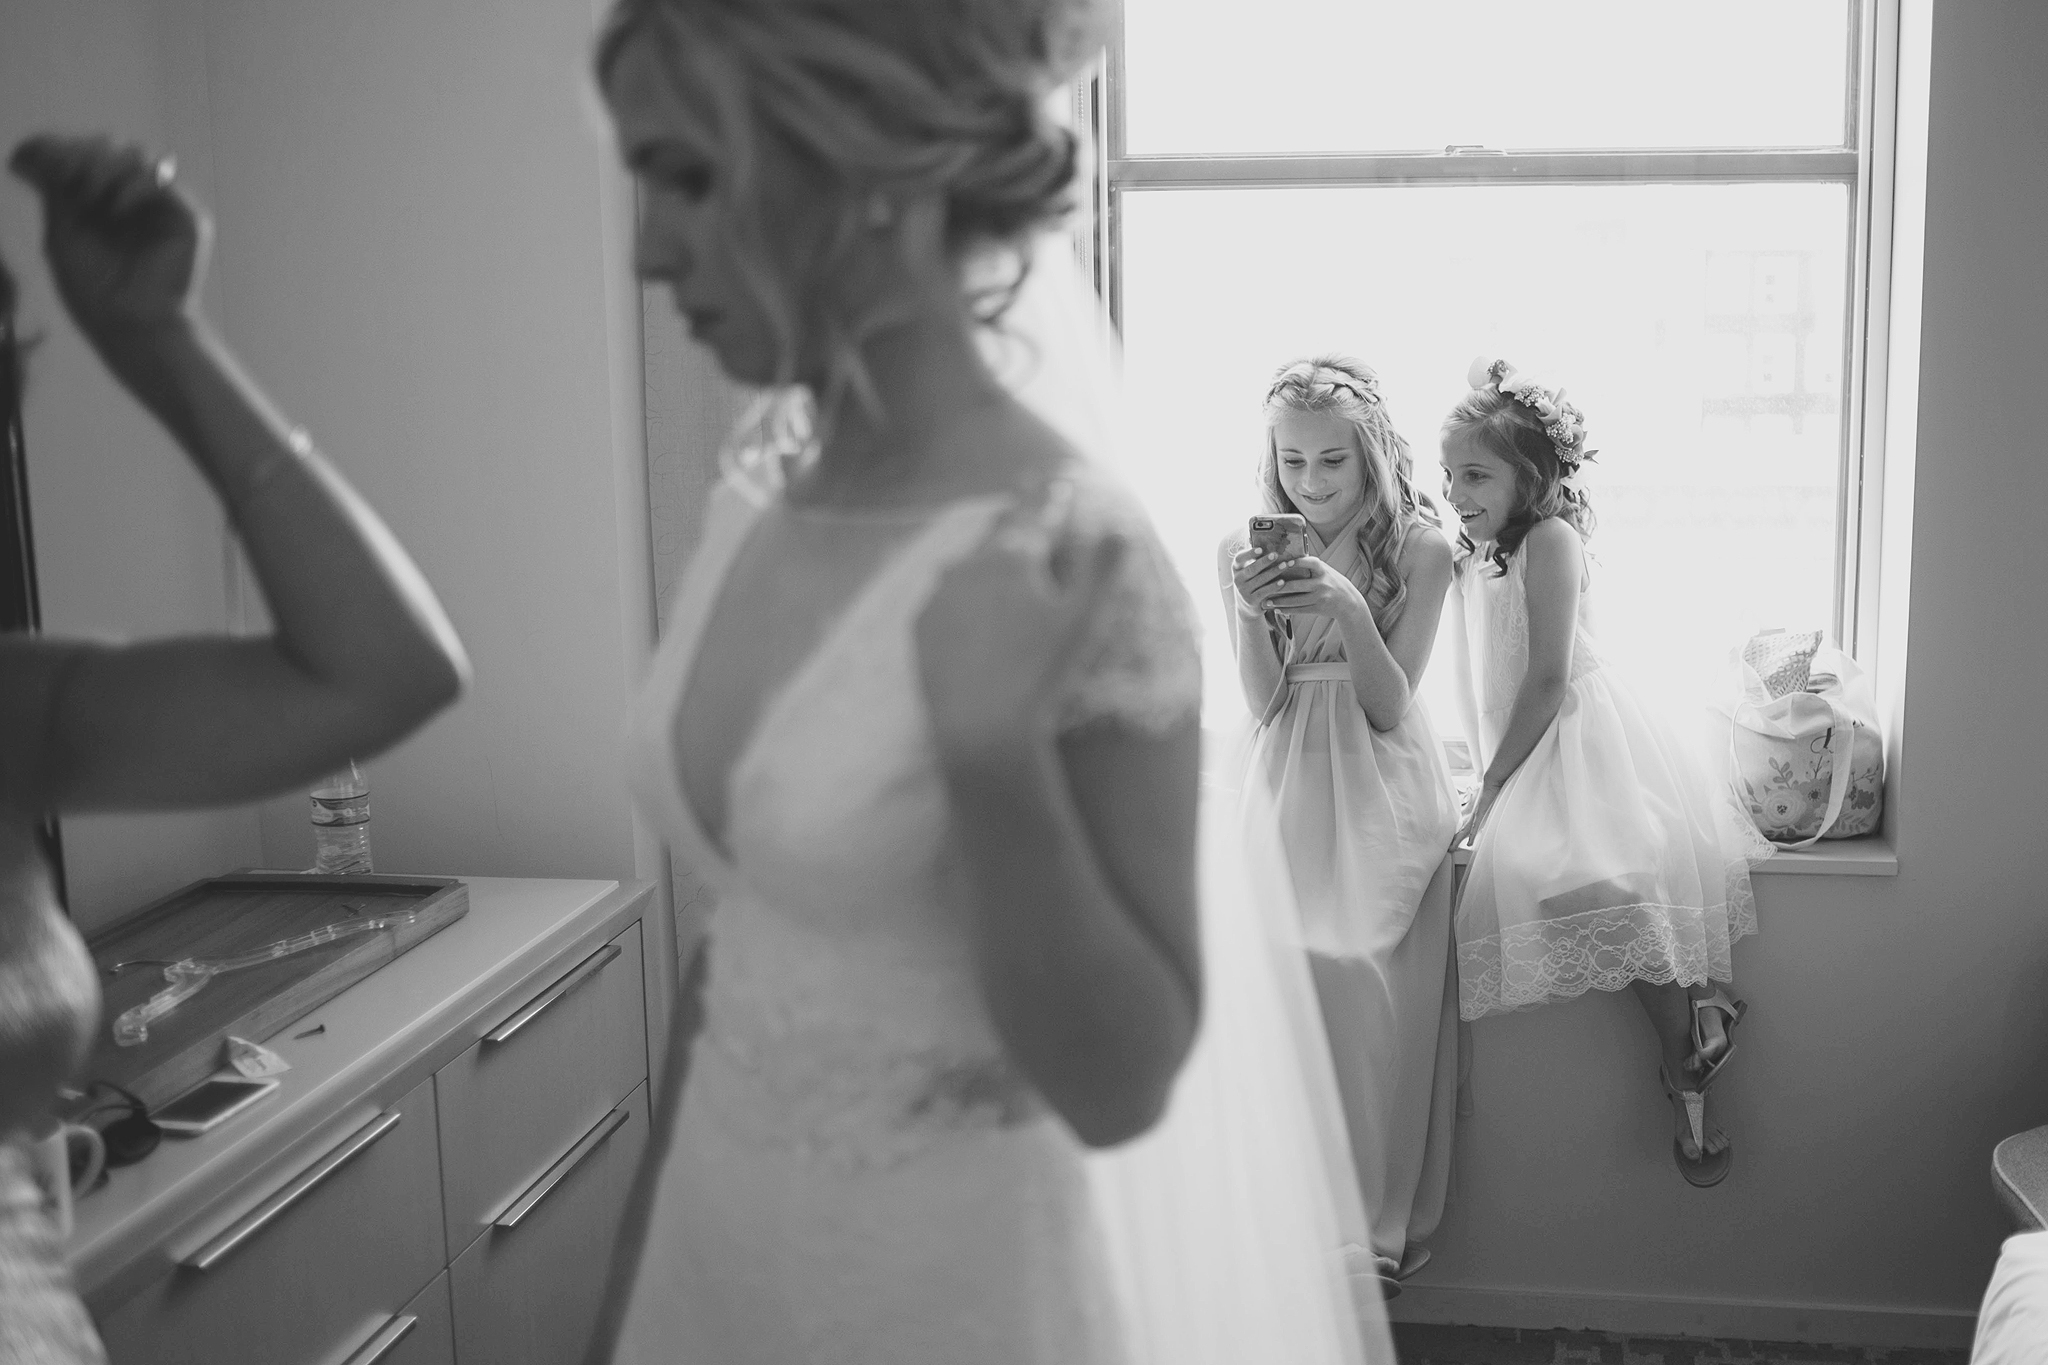 Cincinnati-Dayton-OH-Traveling-Wedding-Photographer-Rhinegeist-Brewery-Ault-Park-21C-55.jpg